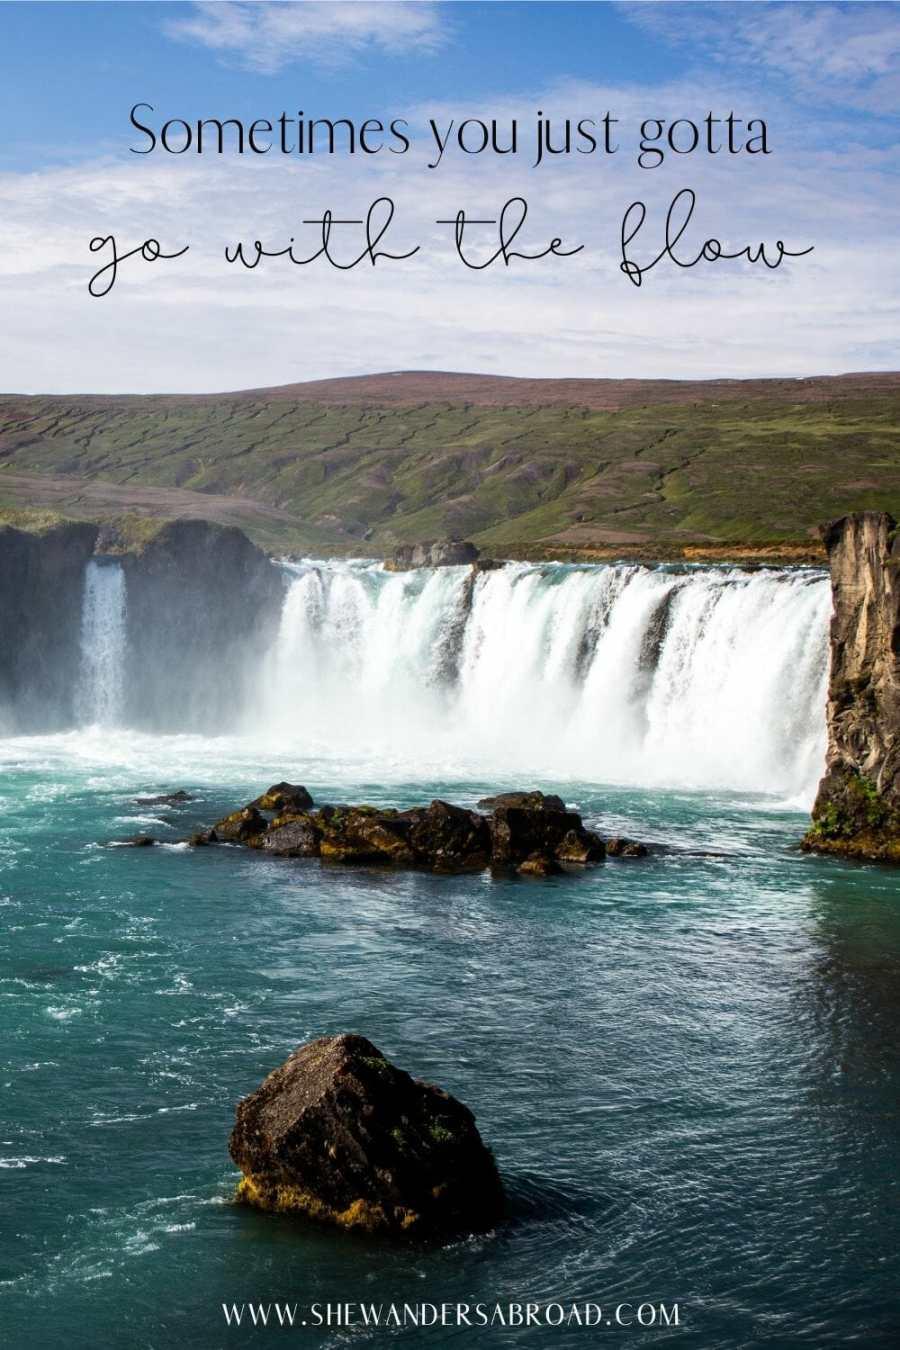 Hilarious waterfall puns